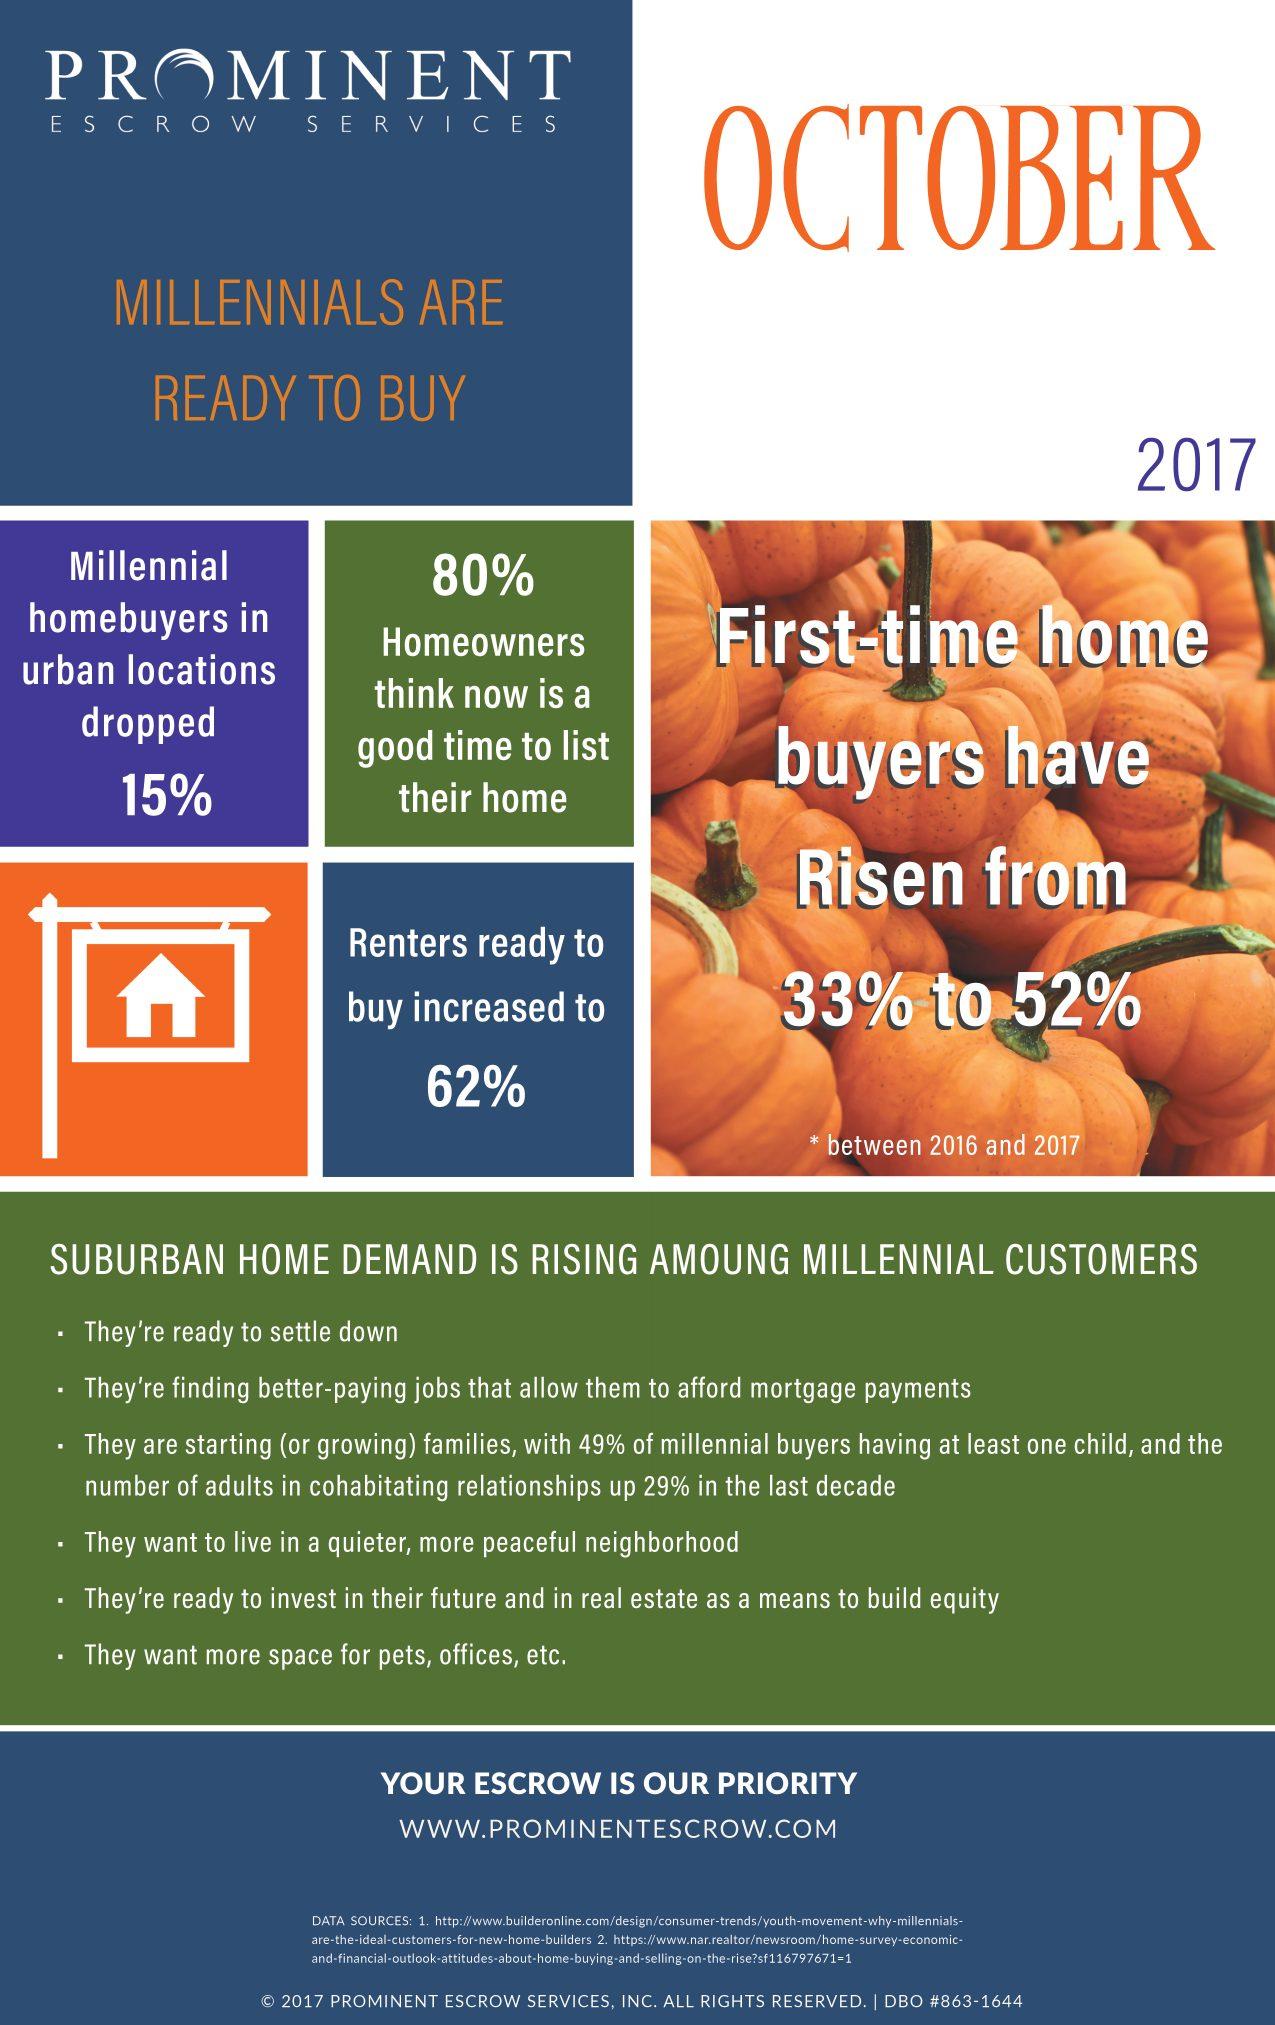 10-1-17 Millennials-are-ready-to-Buy_Oct17-1-e1506734939584.jpg